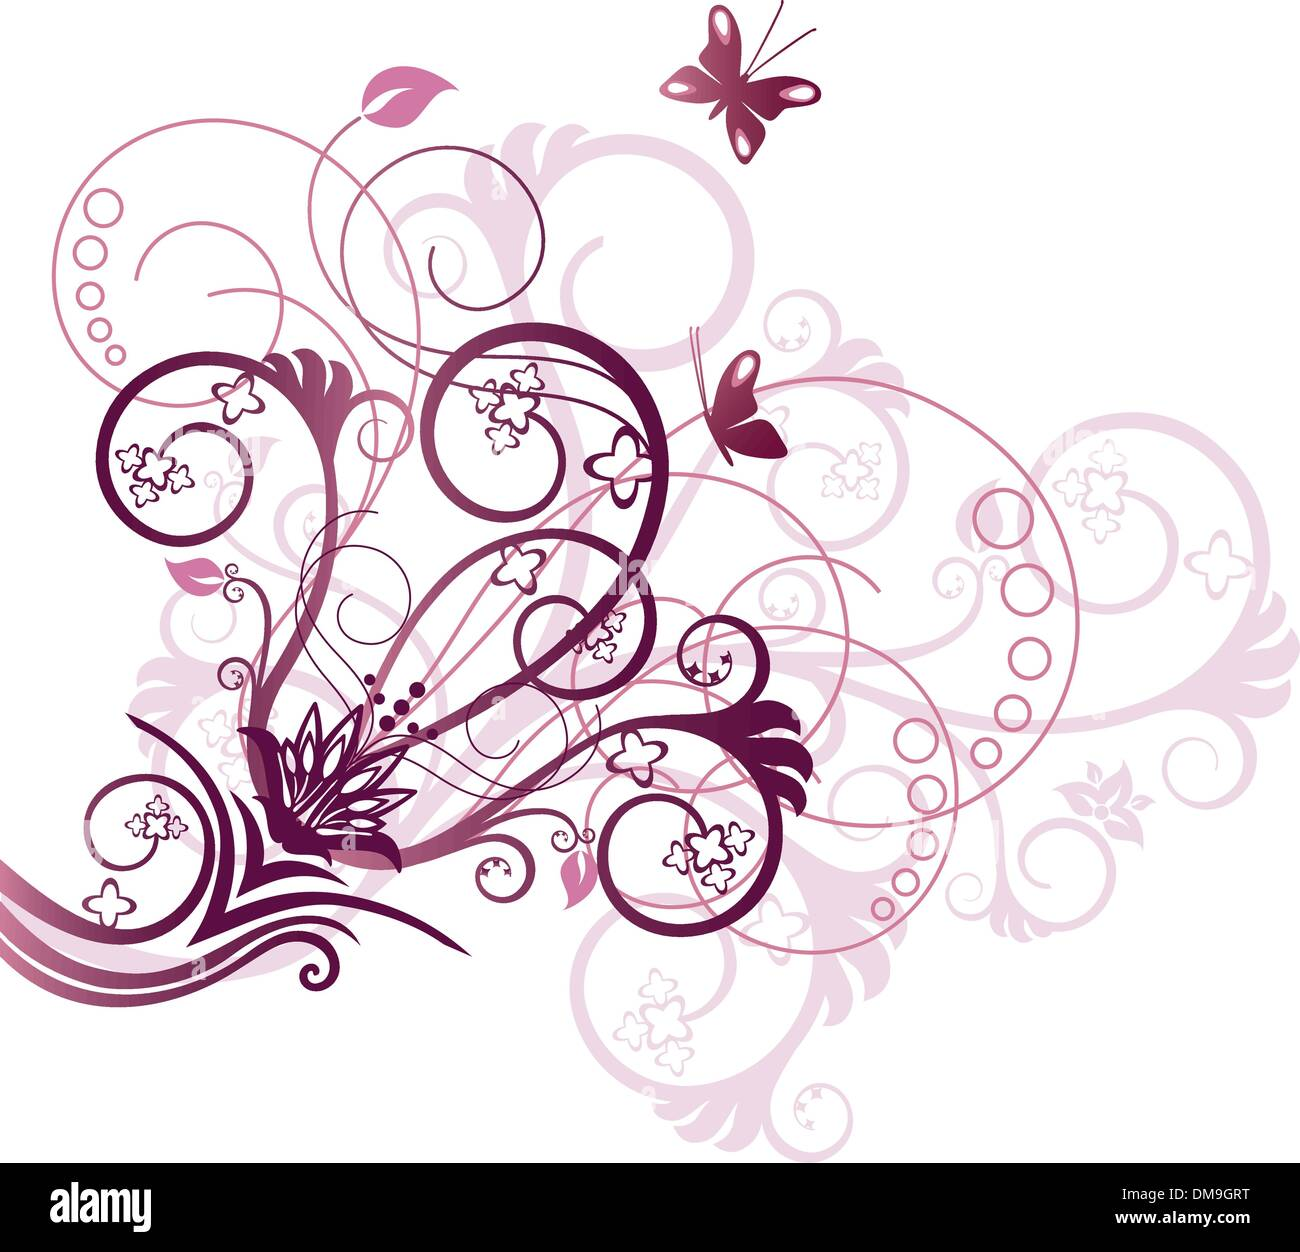 purple and pink floral corner design element stock vector